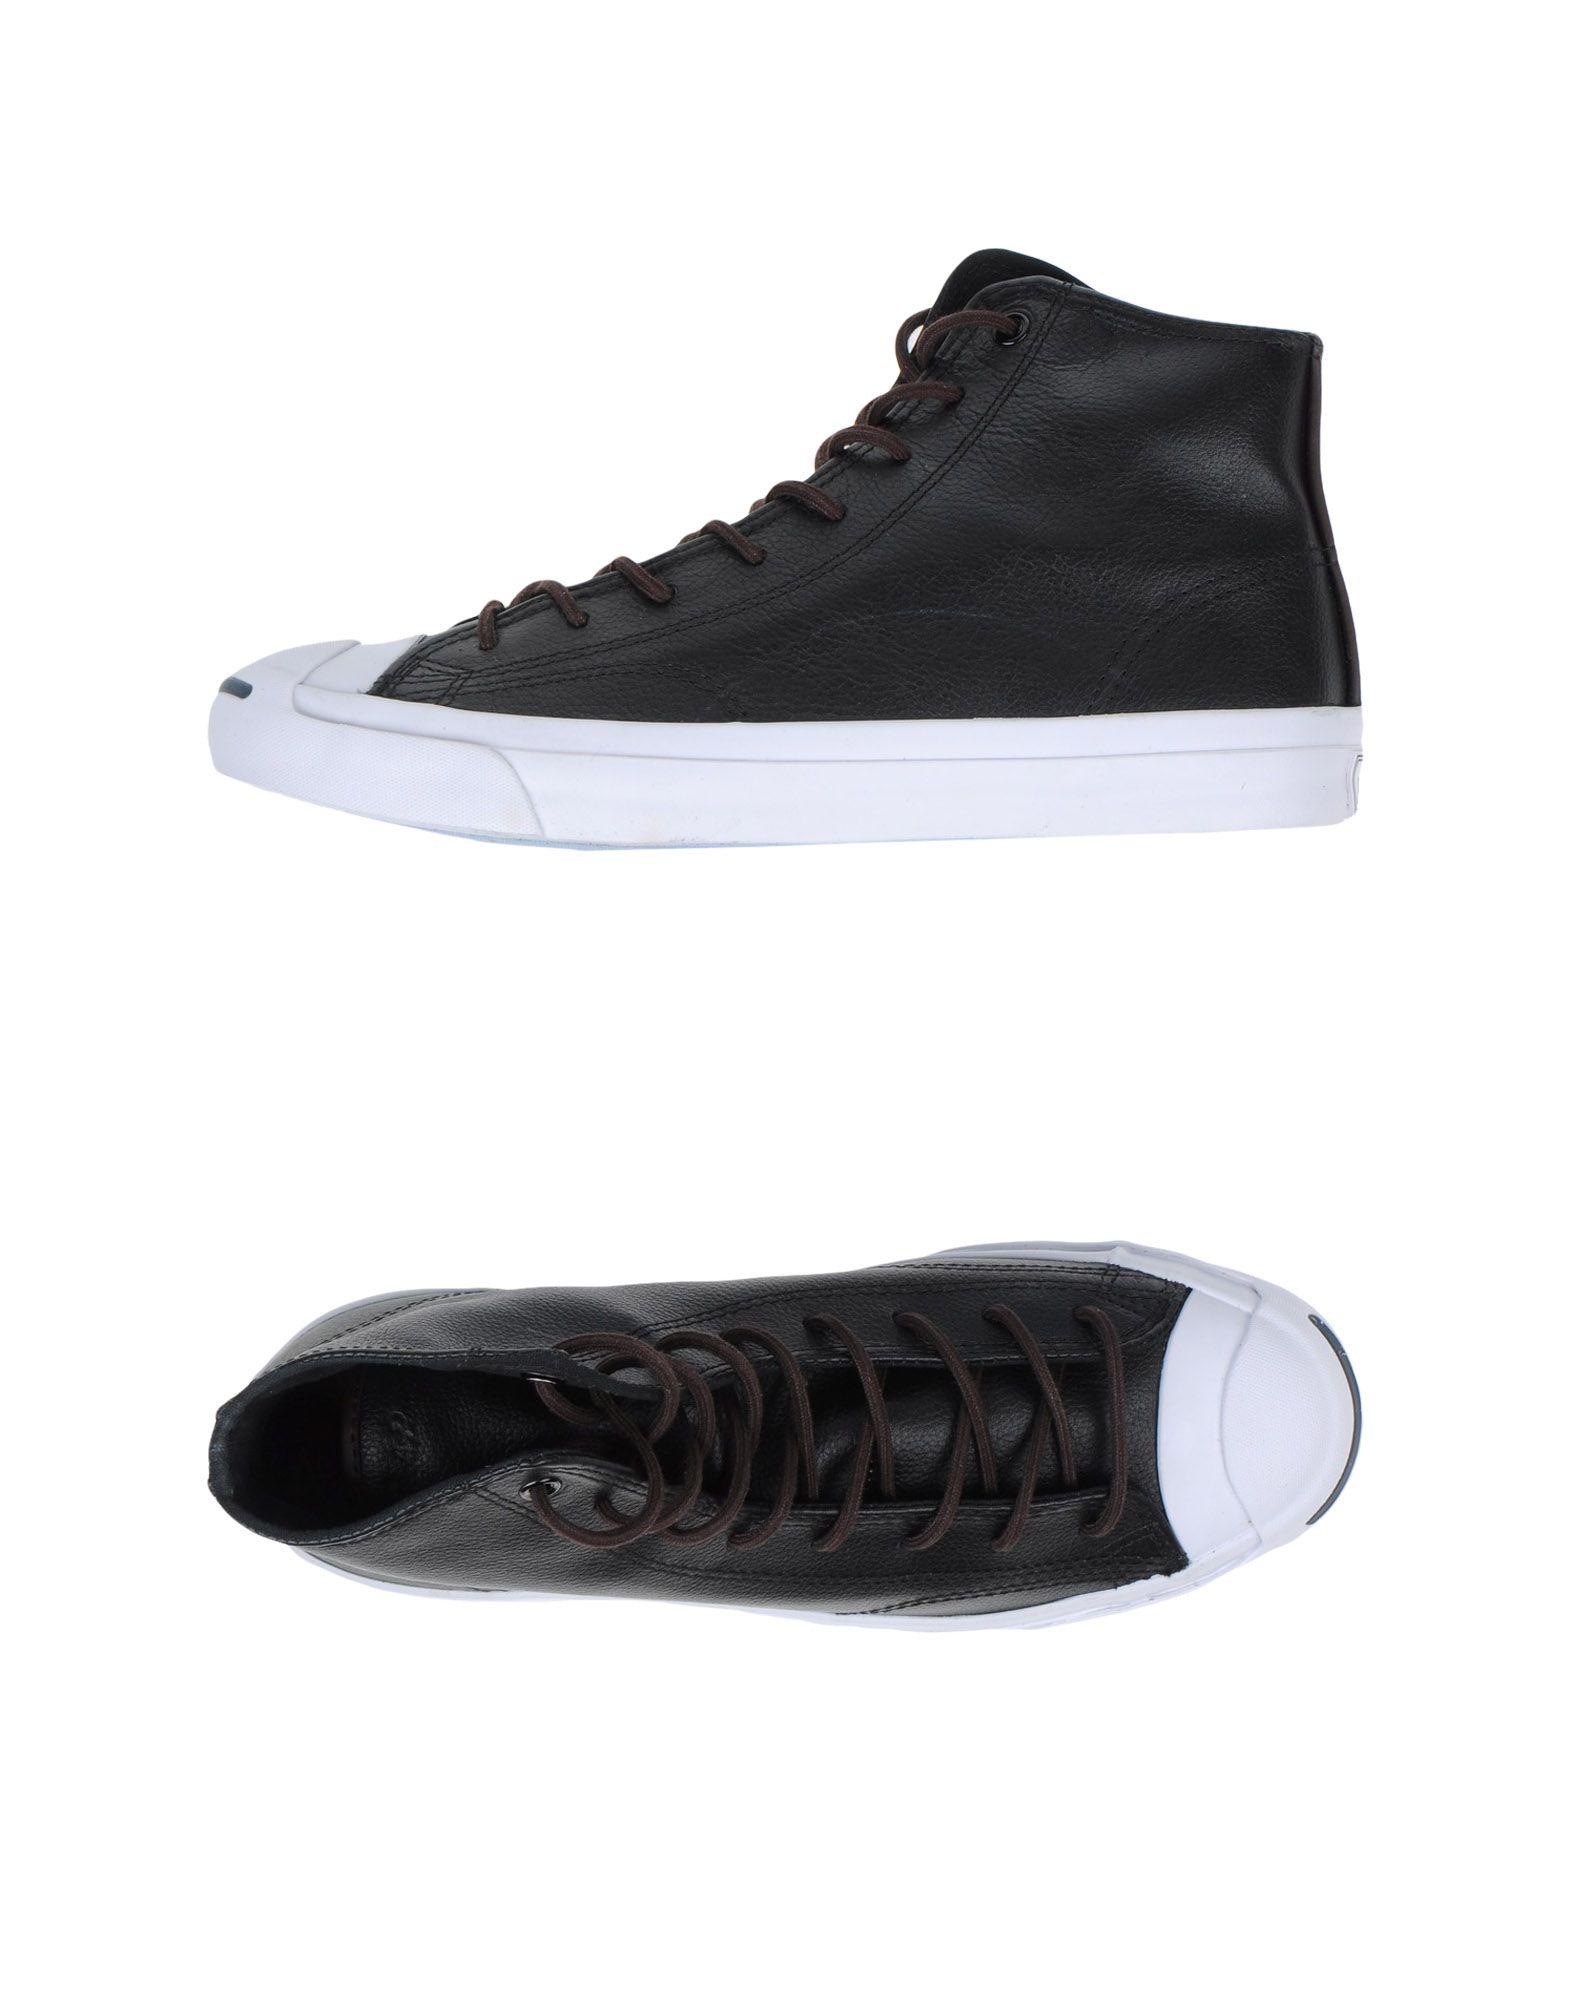 Scarpe Leather da Ginnastica Converse Jack Purcell Ltt Mid Leather Scarpe - Uomo - 44906918CQ dd2943